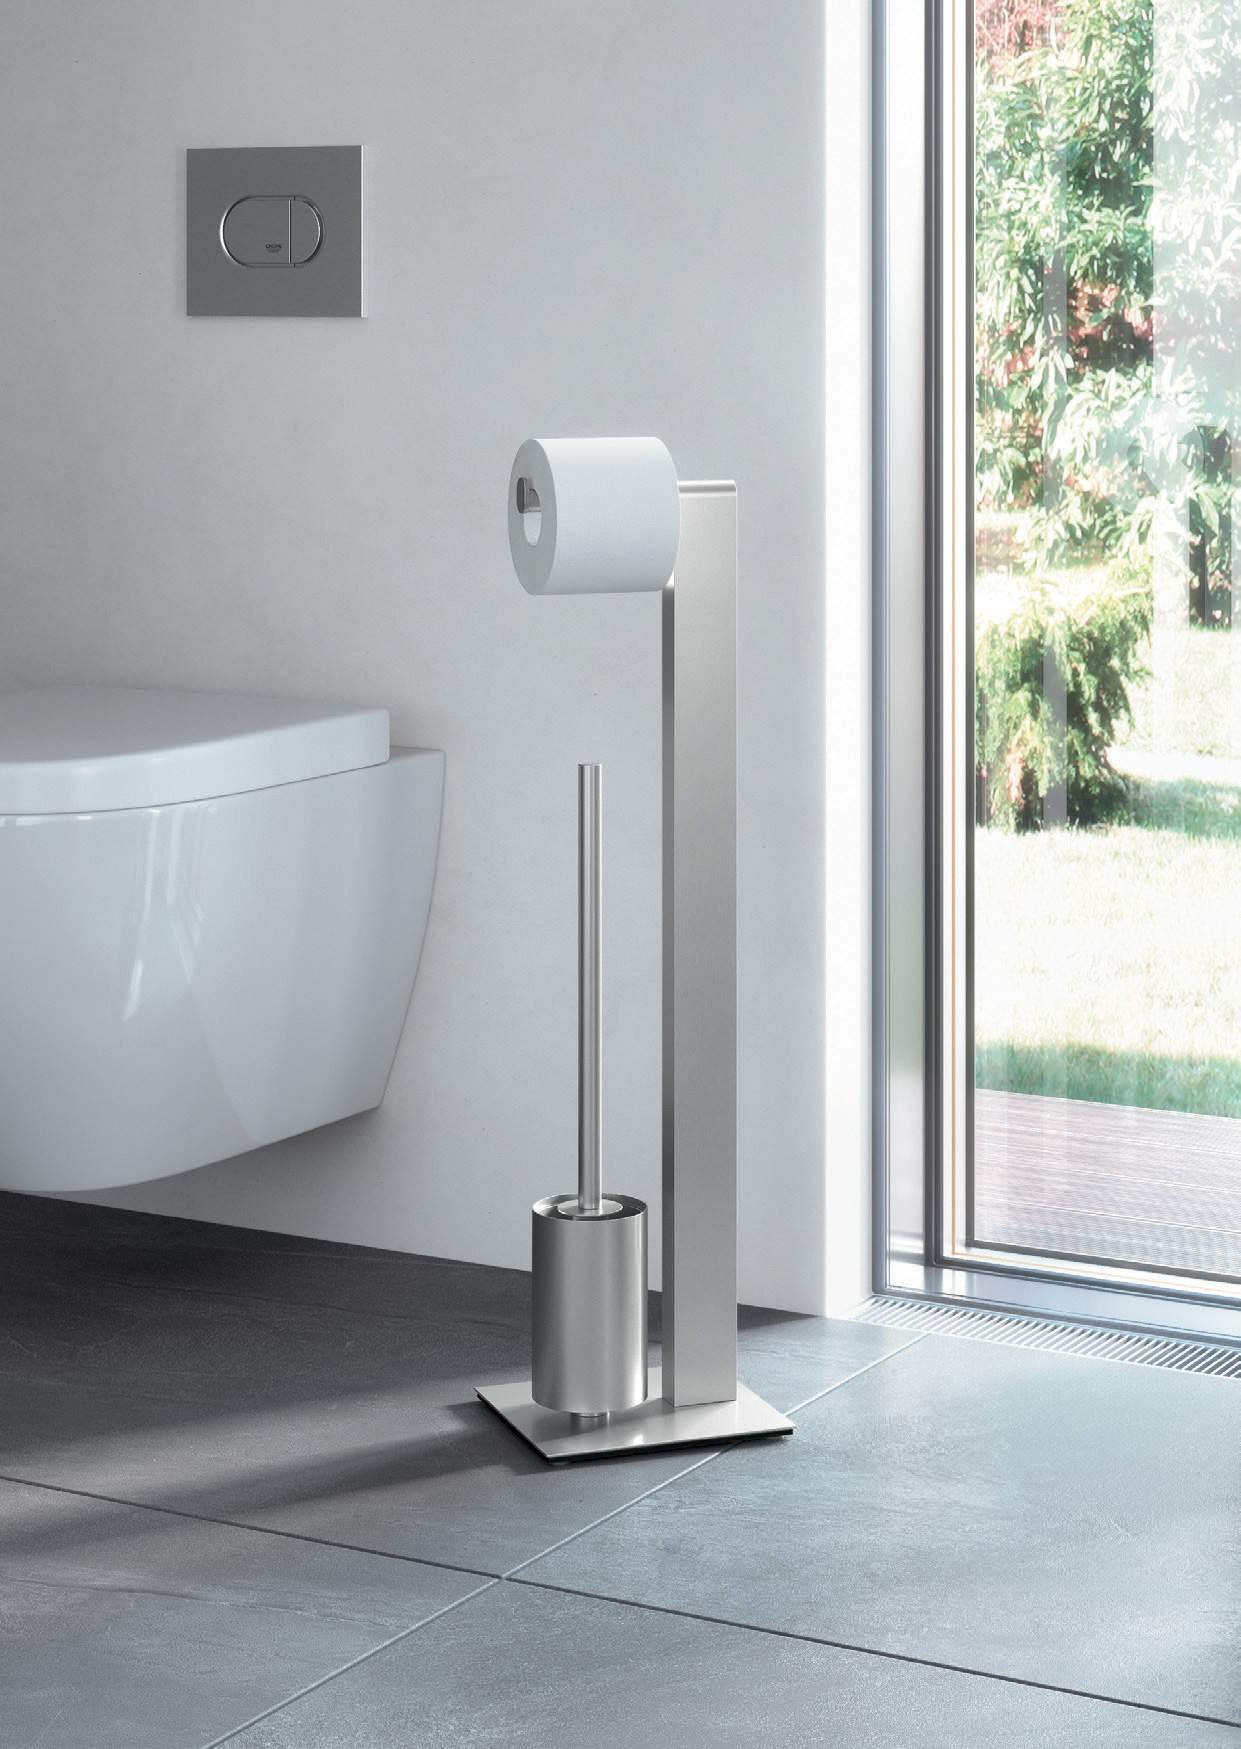 Modern ontworpen wc-butler van Zack.